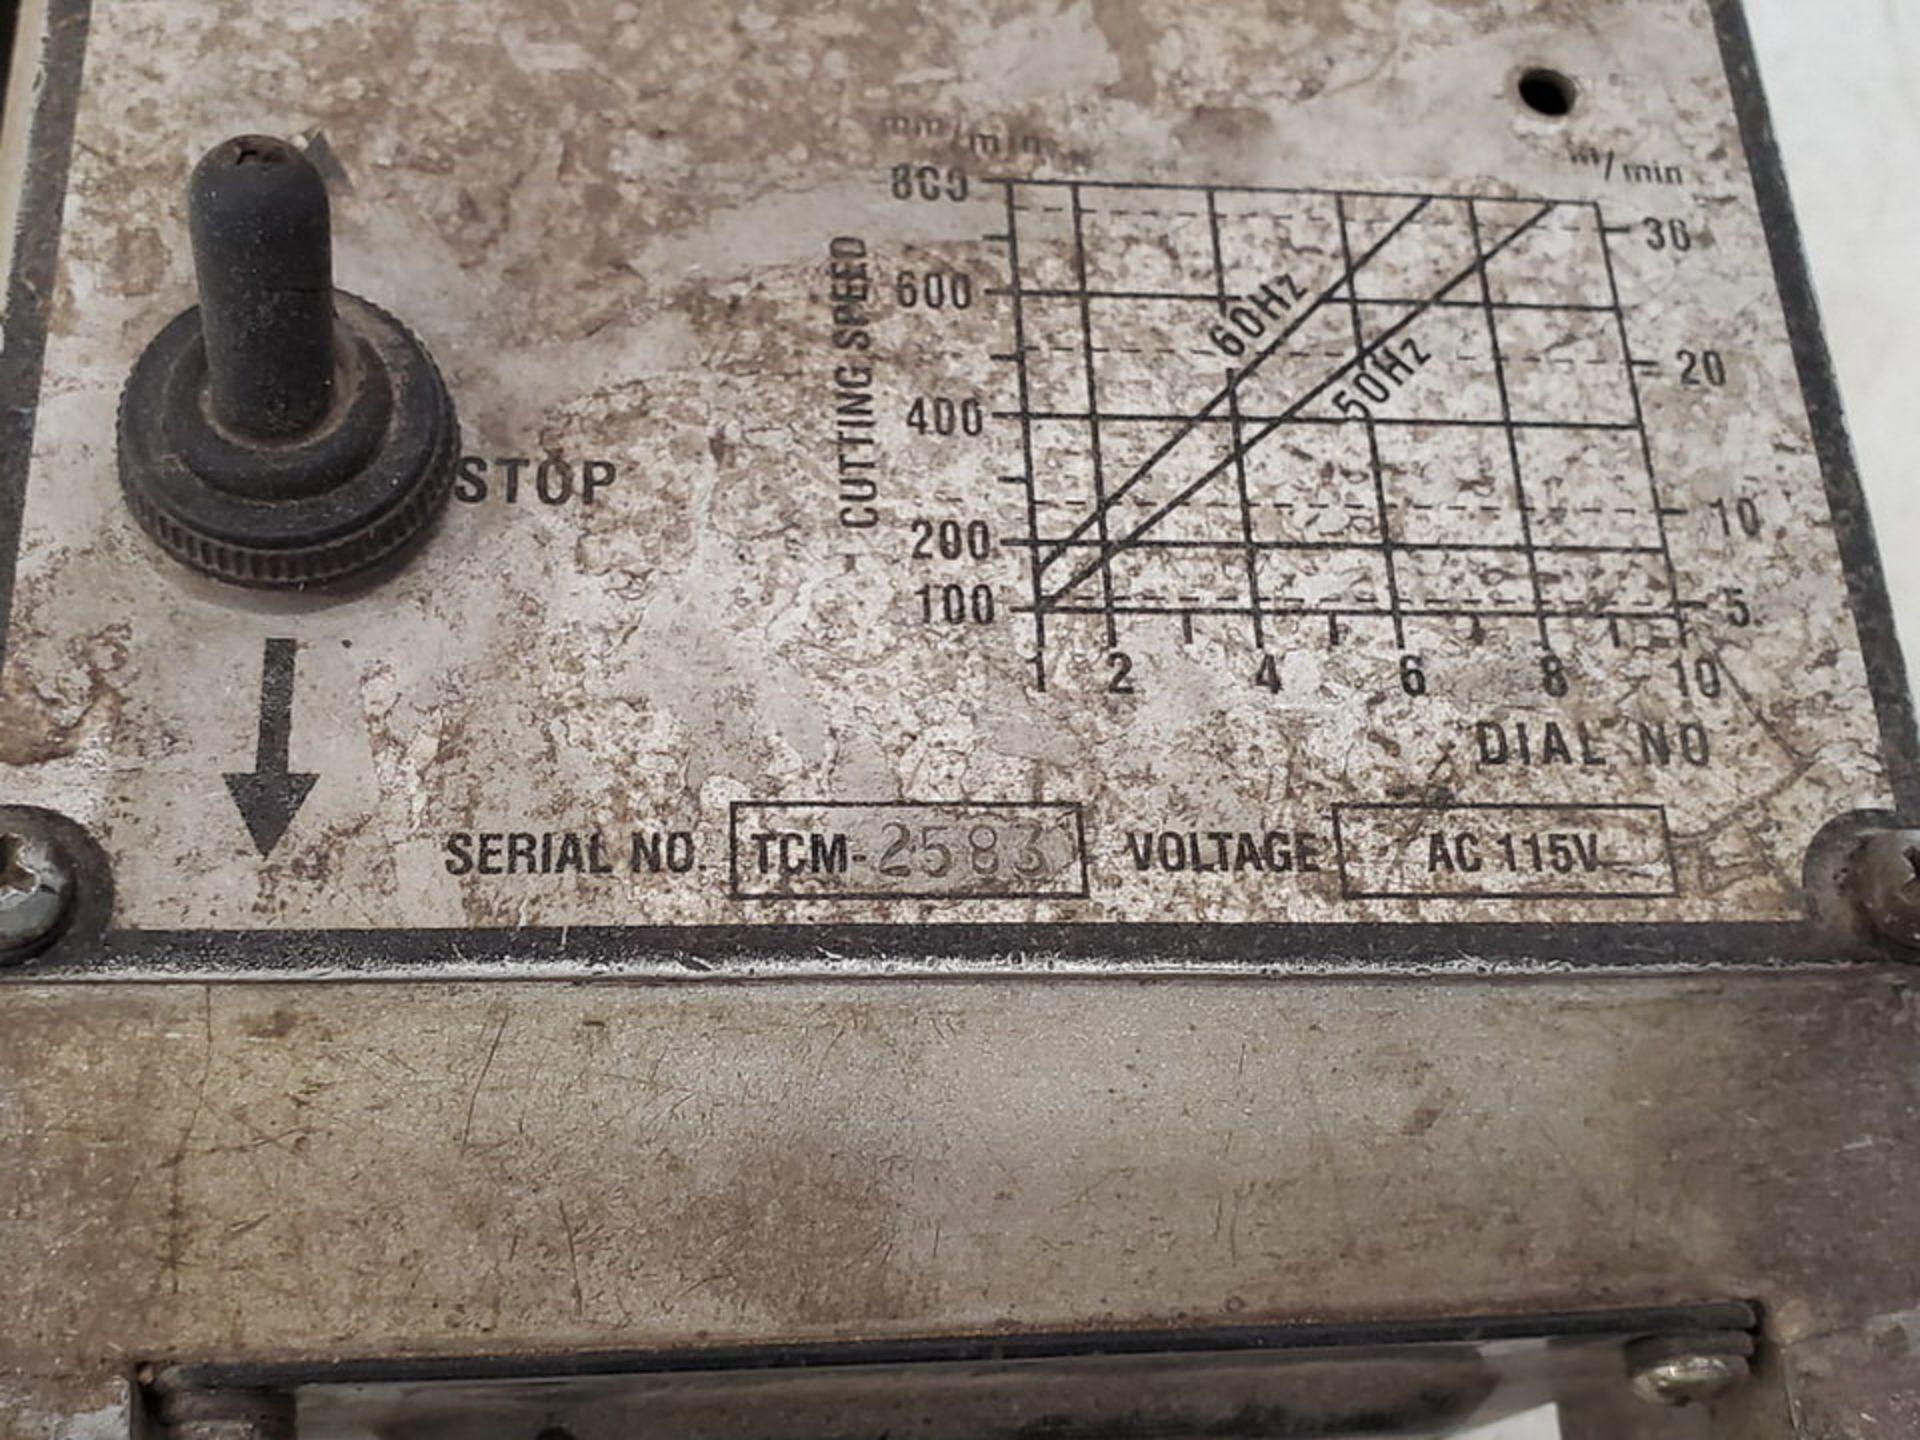 Profax Portable Track Cutting Machine 115V - Image 5 of 5